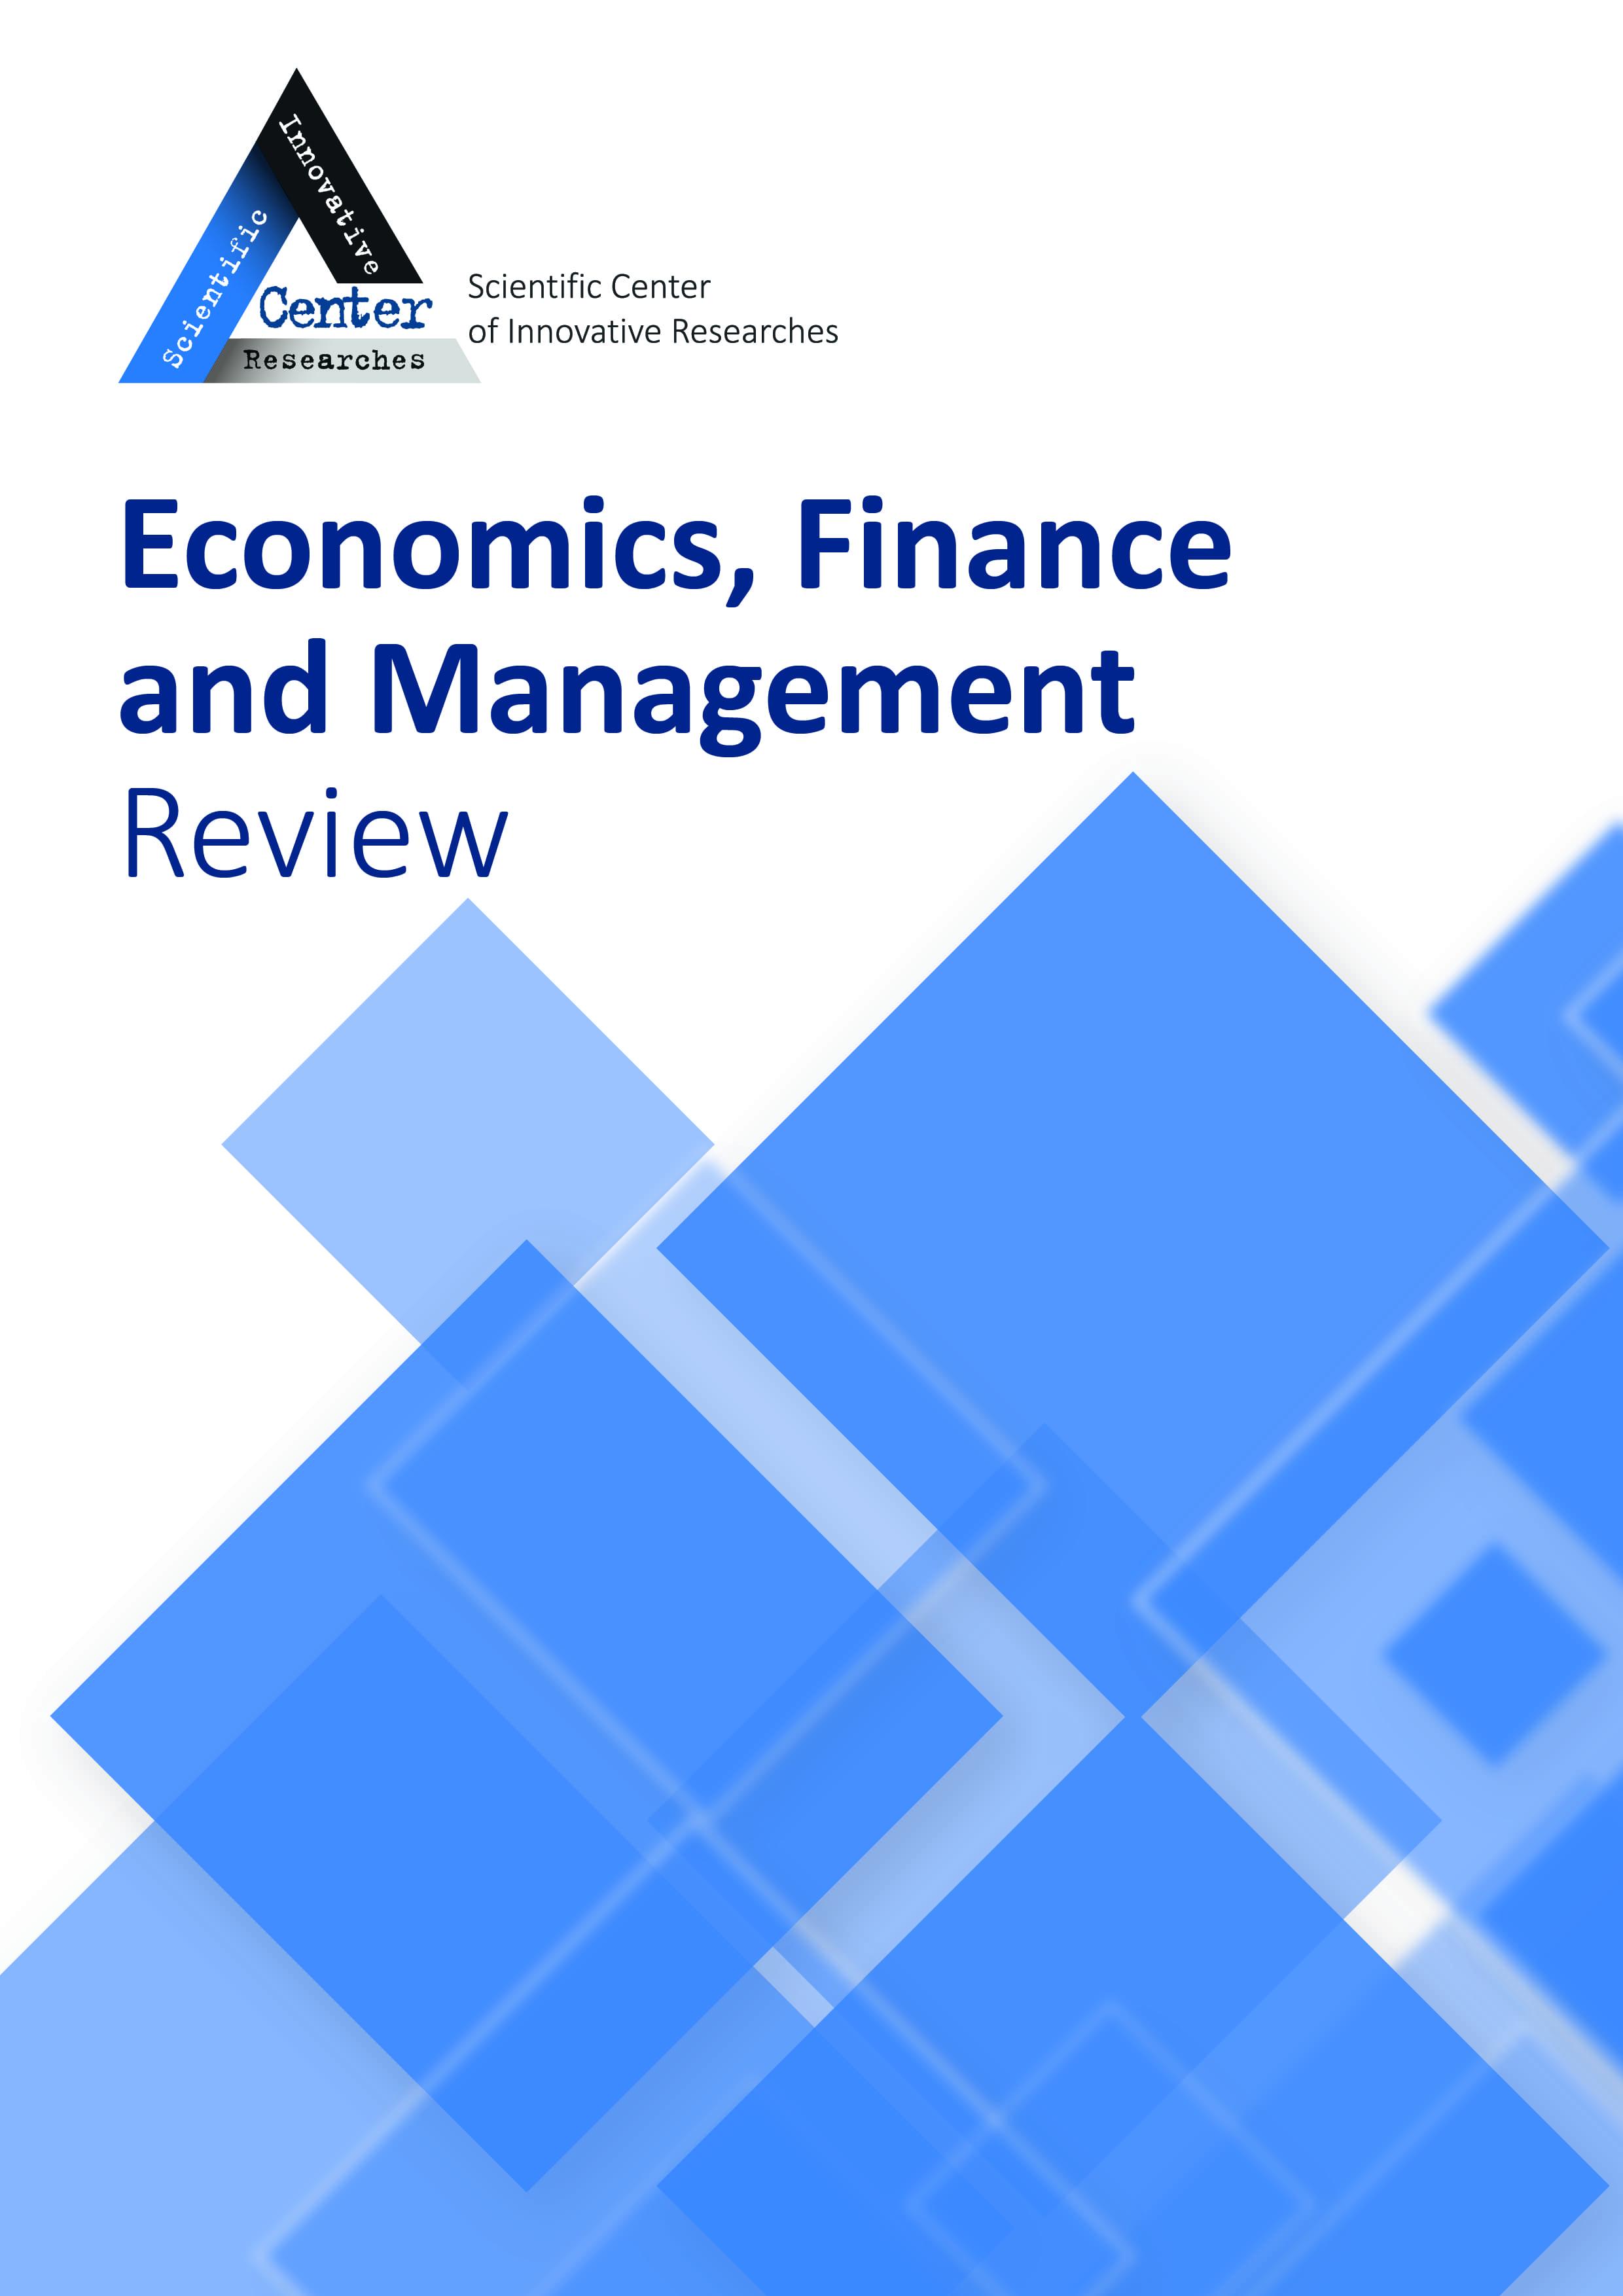 View No. 1 (2021): Economics, Finance And Management Review